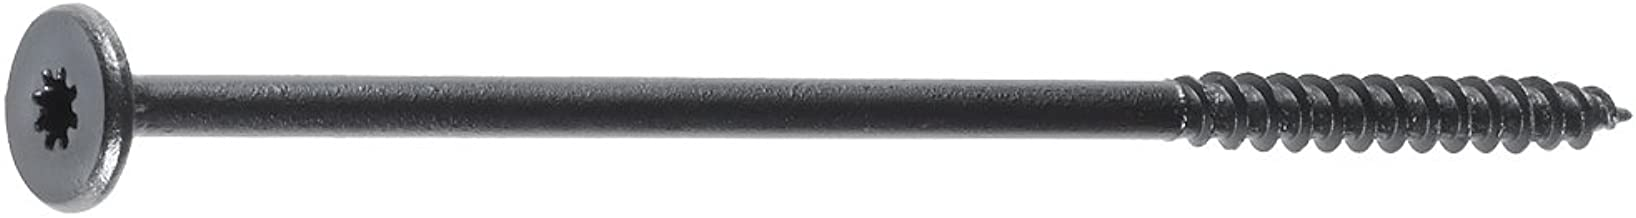 FastenMaster FMHLGM007-250 HeadLOK Heavy-Duty Flathead Fastener, 7 Inches, 250-Count